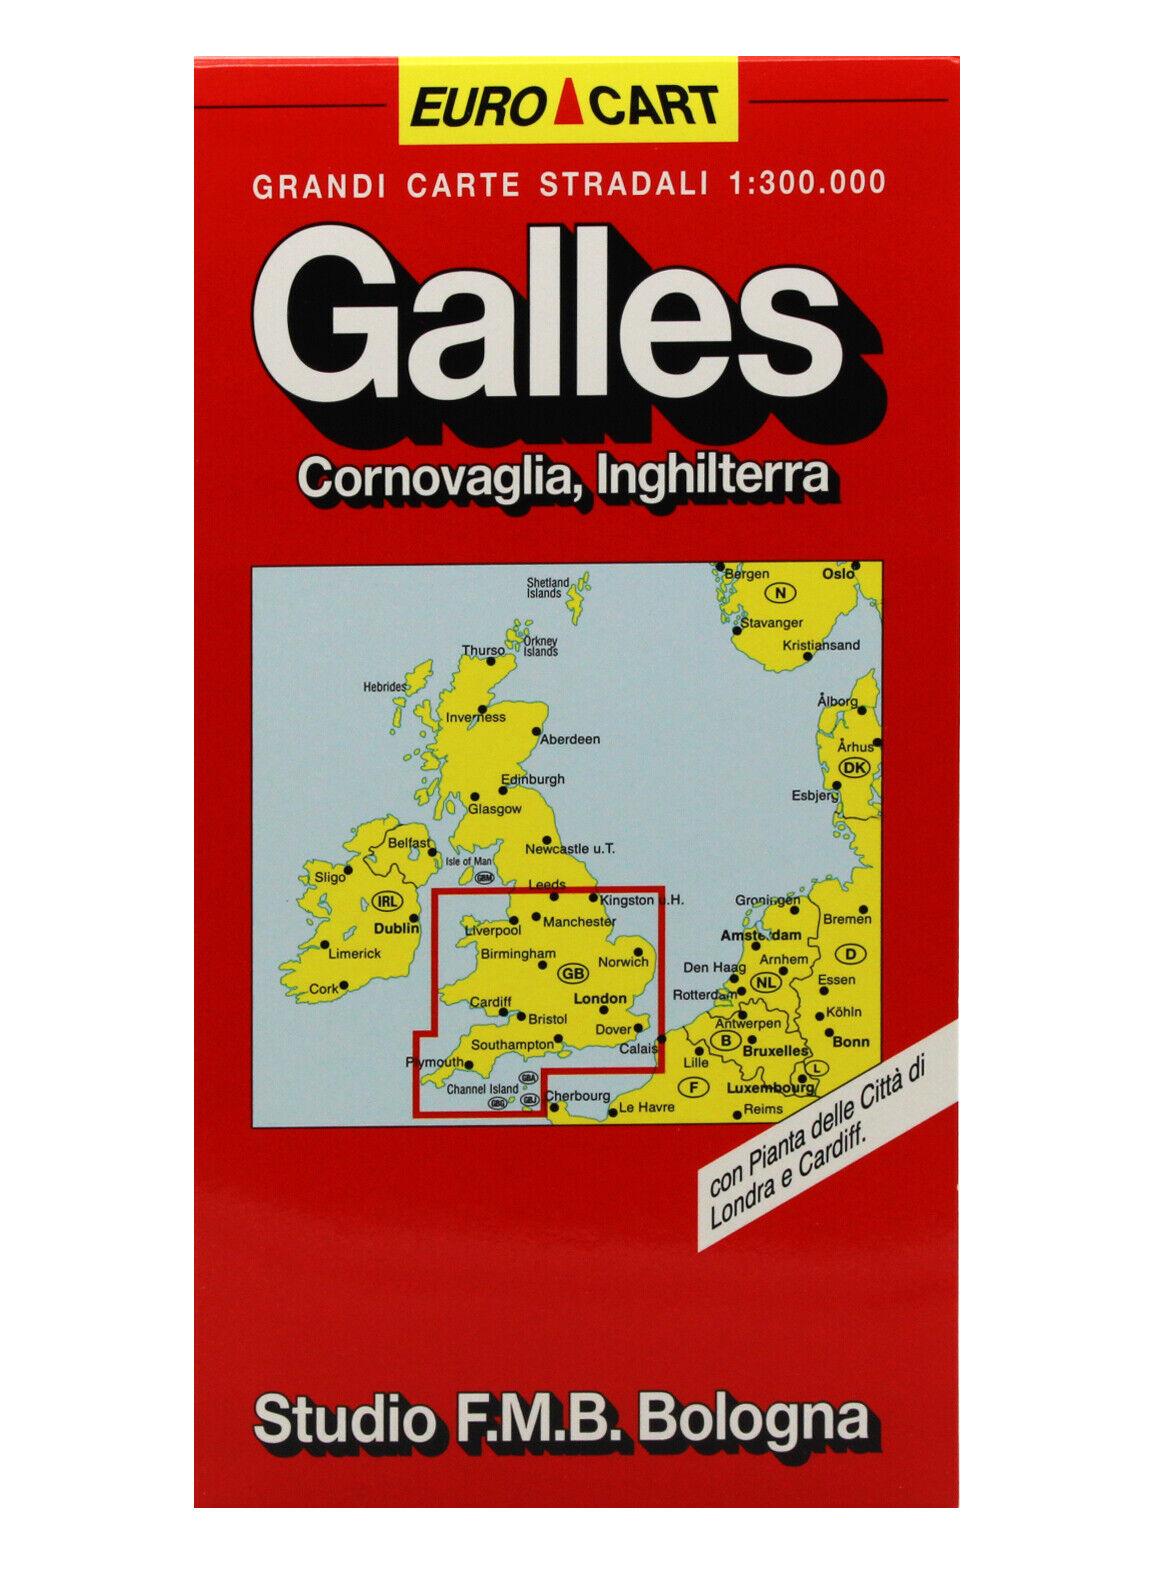 Cartina Stradale Inghilterra Del Sud.Galles Cornovaglia Inghilterra Cartina Stradale 1 300 000 Carta Mappa F M B Ebay